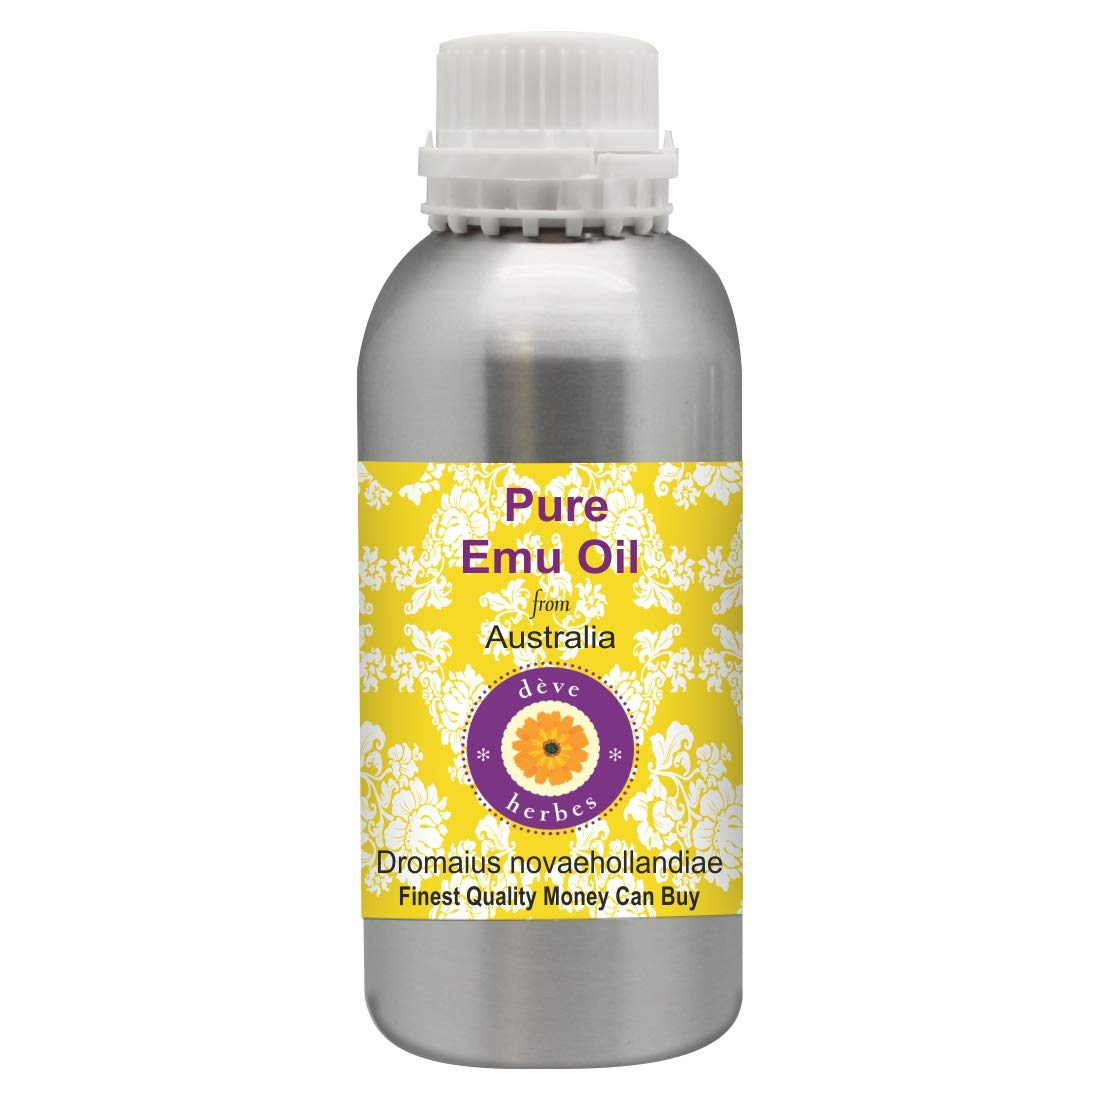 Deve Herbes Pure Emu Oil (Dromaius novaehollandiae) 100% Natural Therapeutic Grade 630ml (21.3oz)